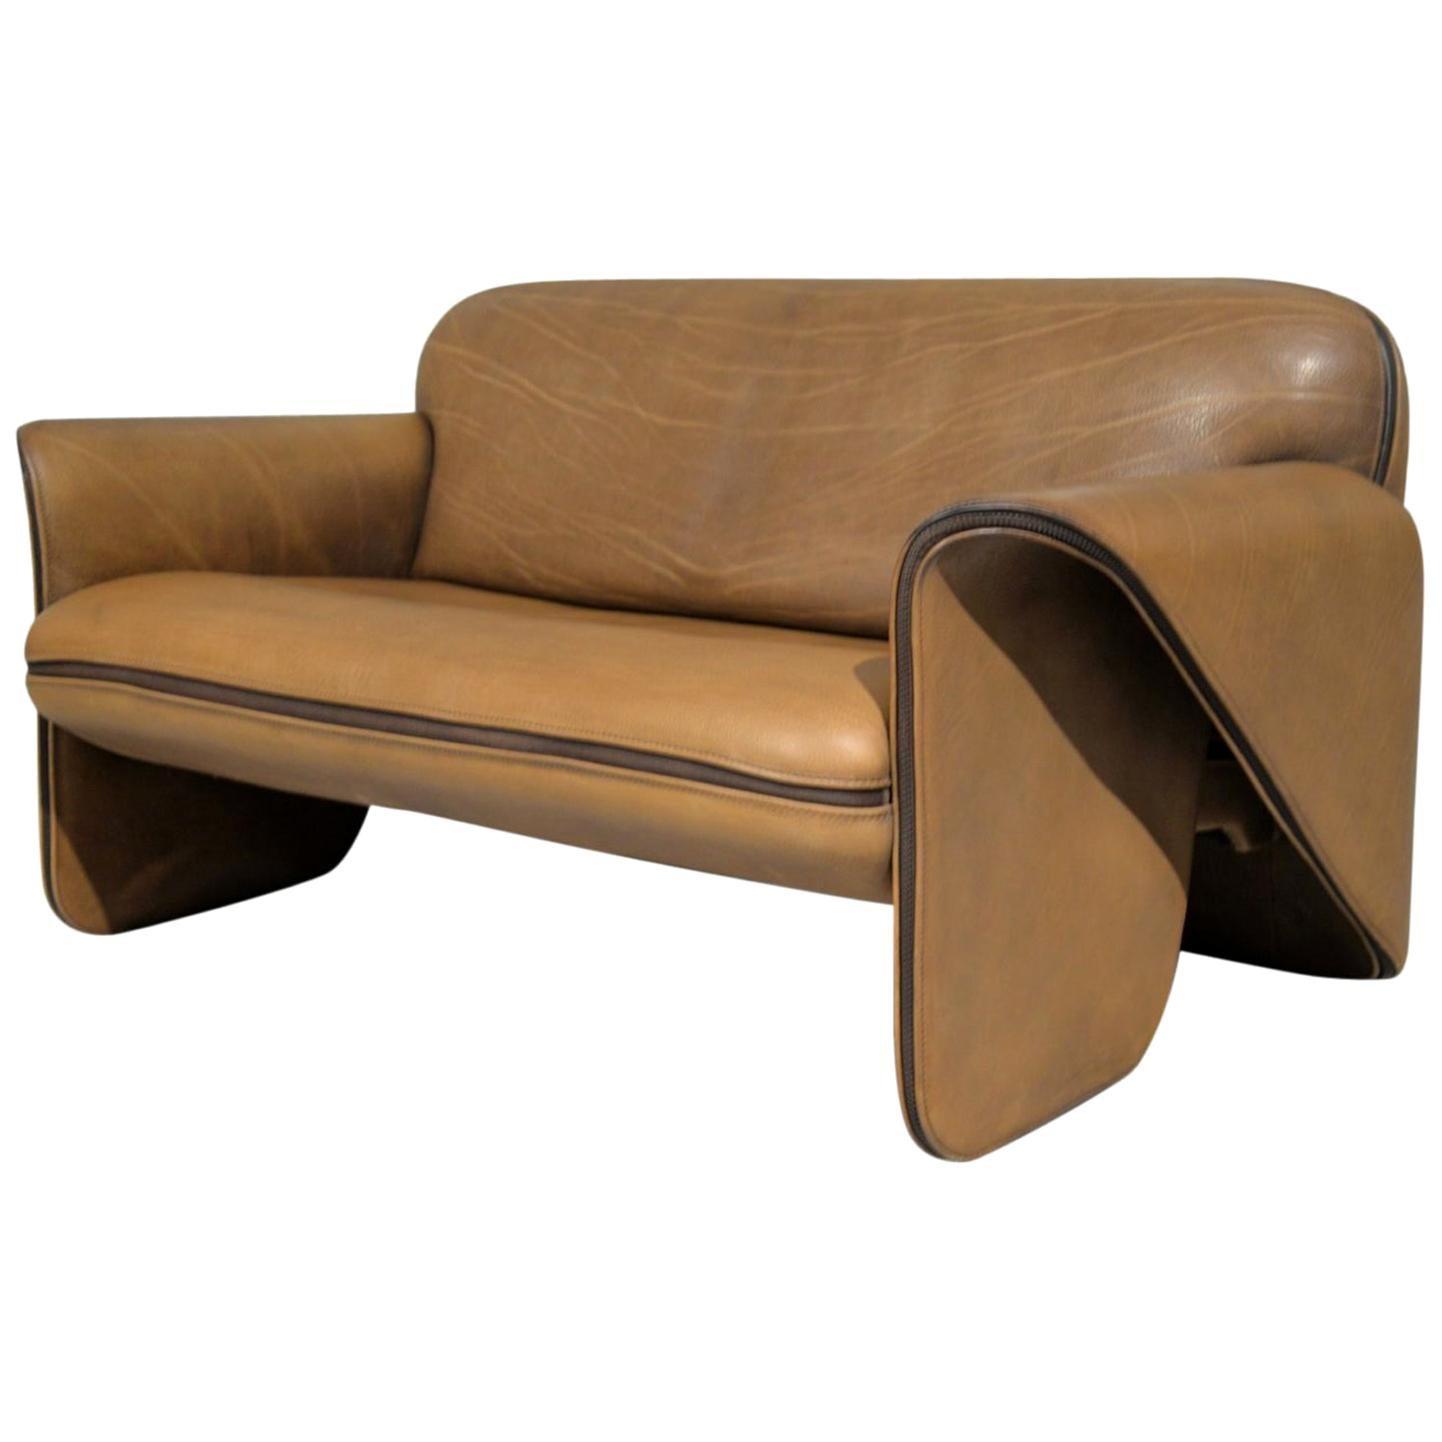 Vintage De Sede DS 125 Sofa Designed by Gerd Lange, Switzerland, 1978